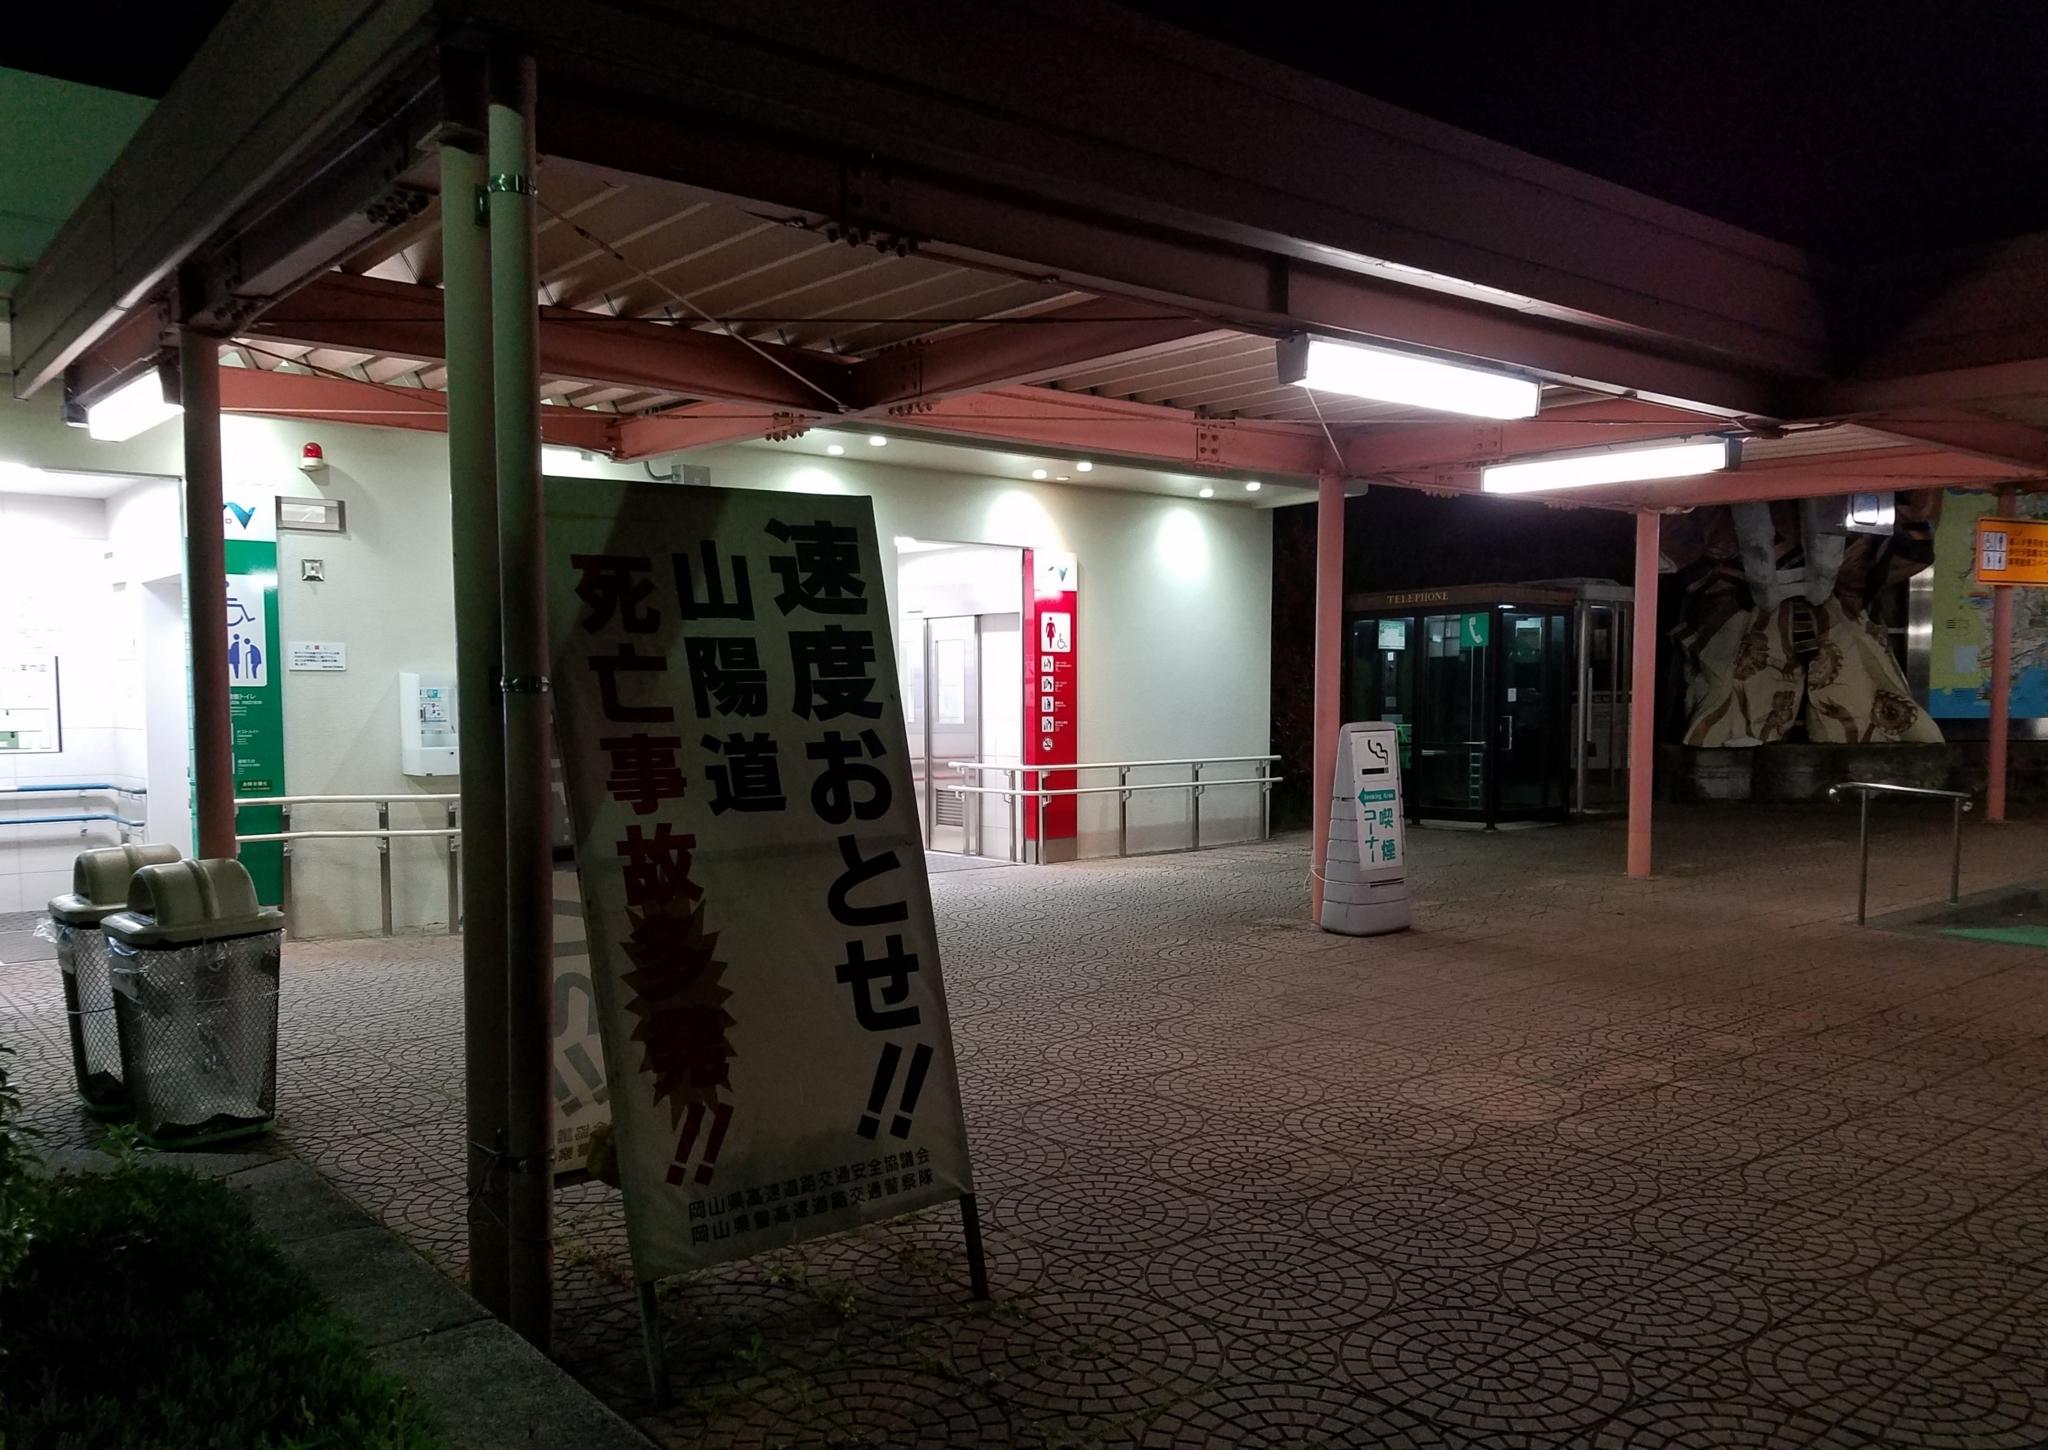 f:id:ToshUeno:20170503015517j:plain